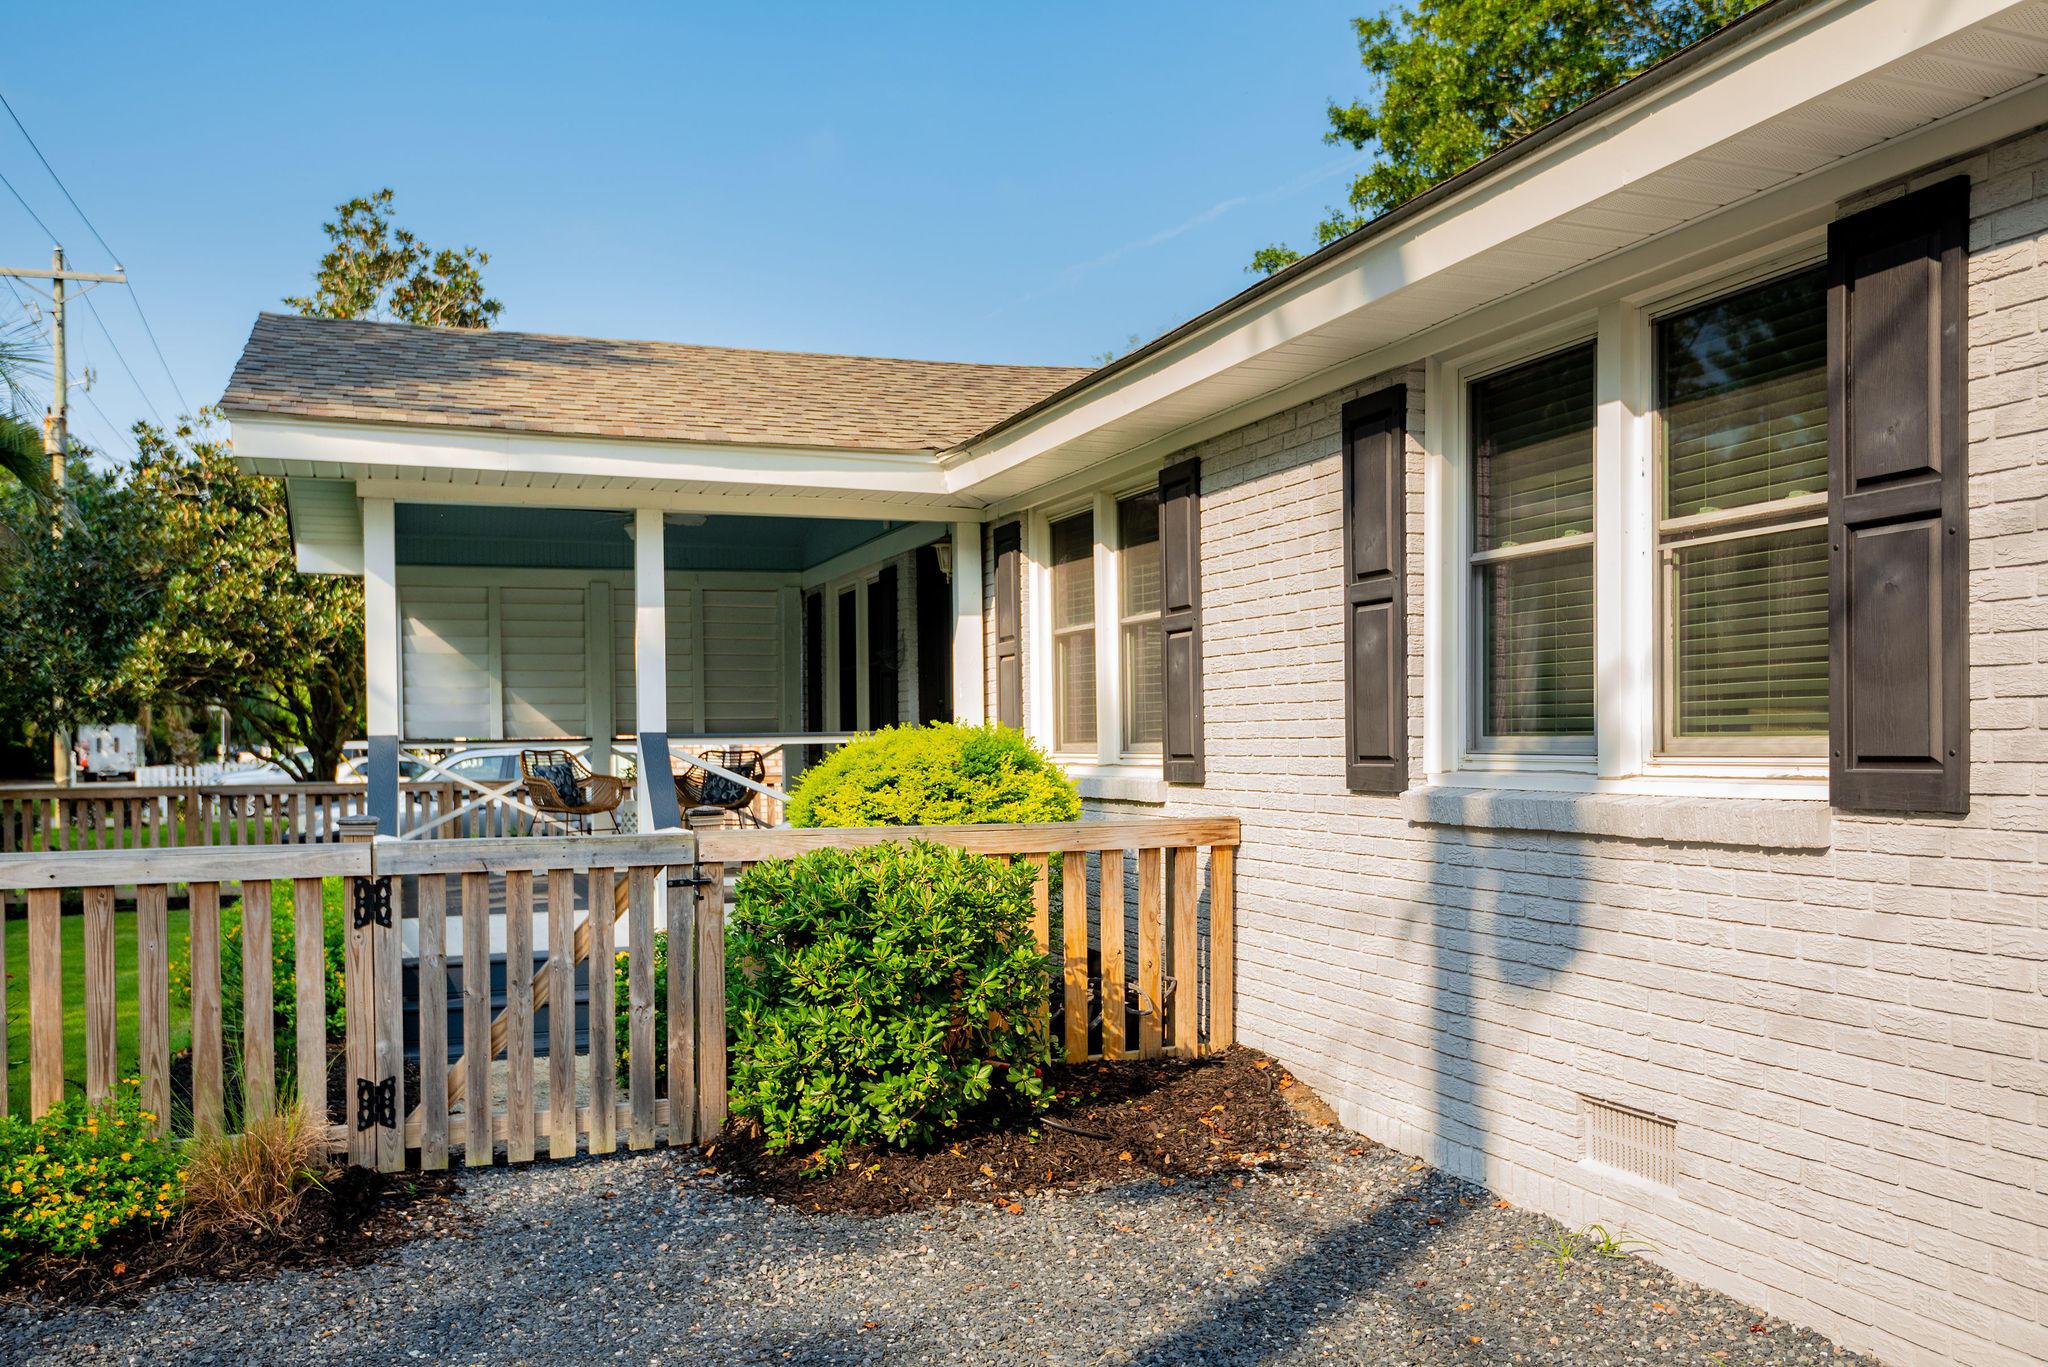 Old Mt Pleasant Homes For Sale - 914 Center, Mount Pleasant, SC - 4